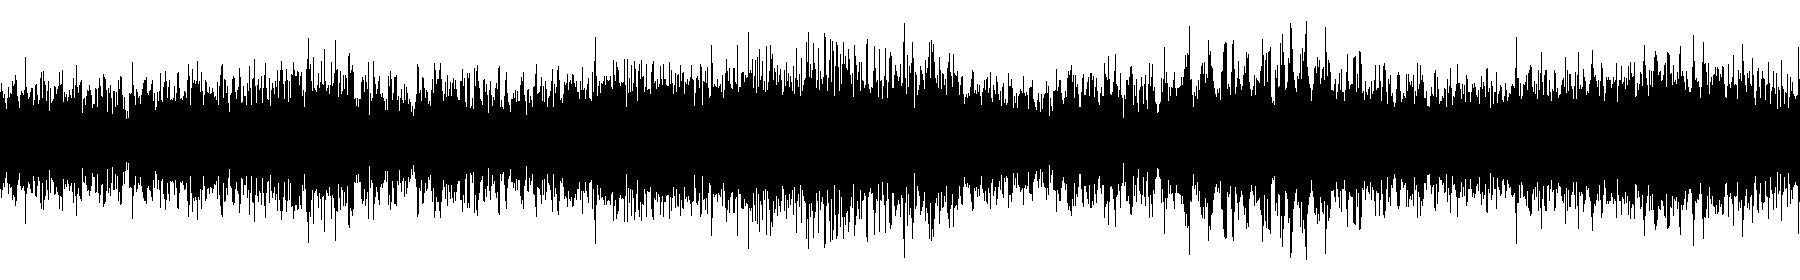 shs ch synthloop 127 fxstring cm